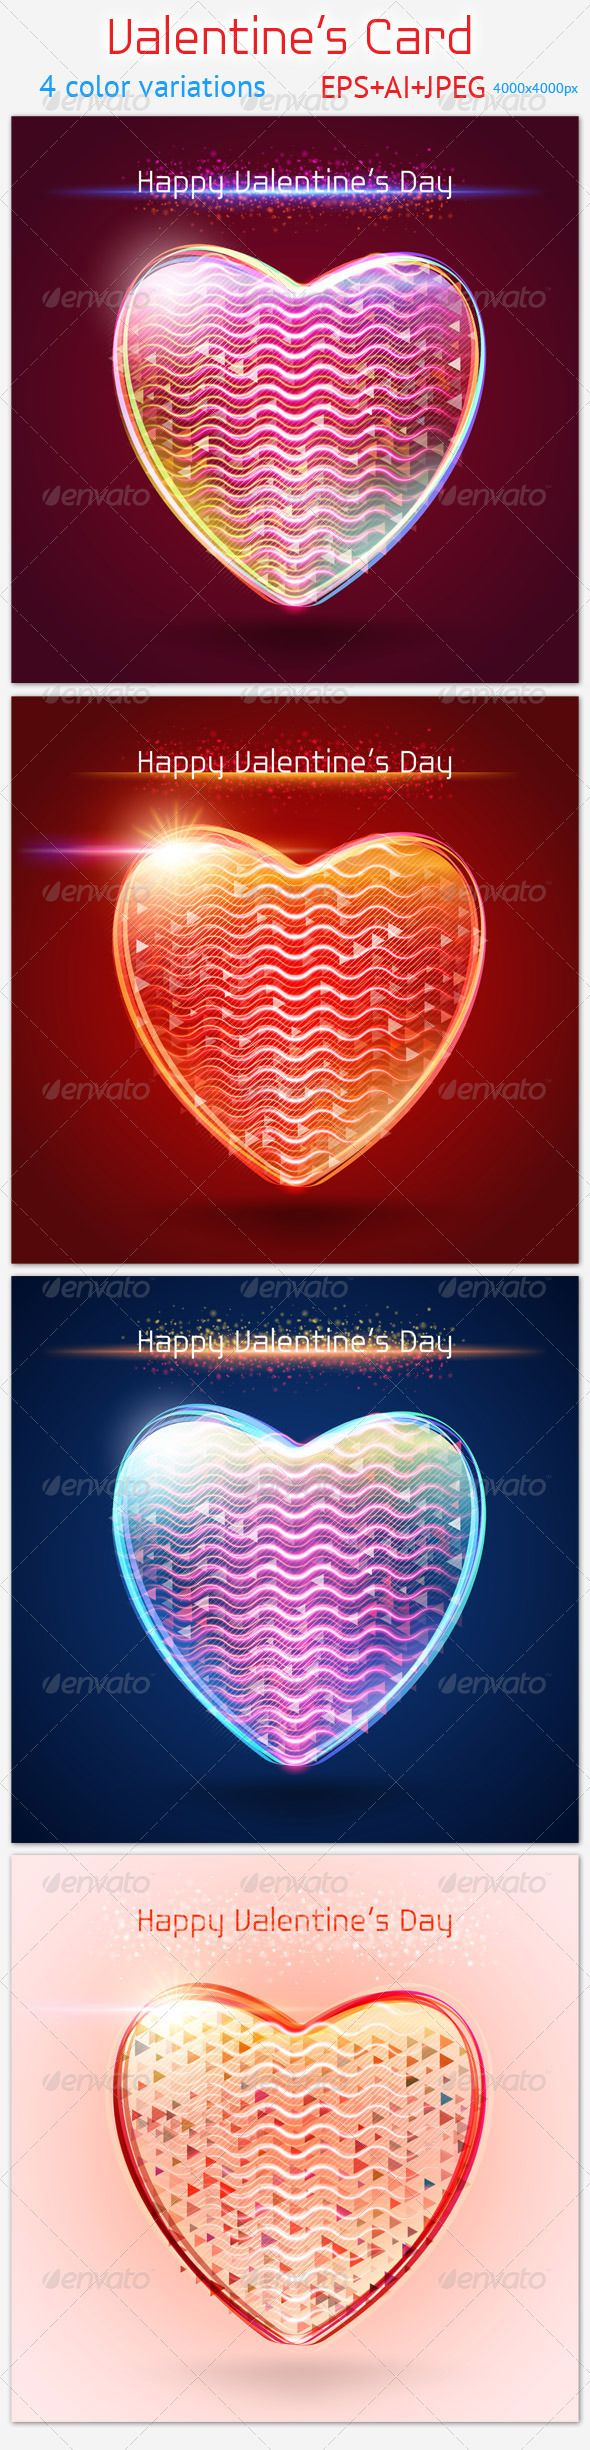 wedding card backgrounds vectors%0A Valentine u    s Card  Vector FileValentine CardsAbstract BackgroundsVector